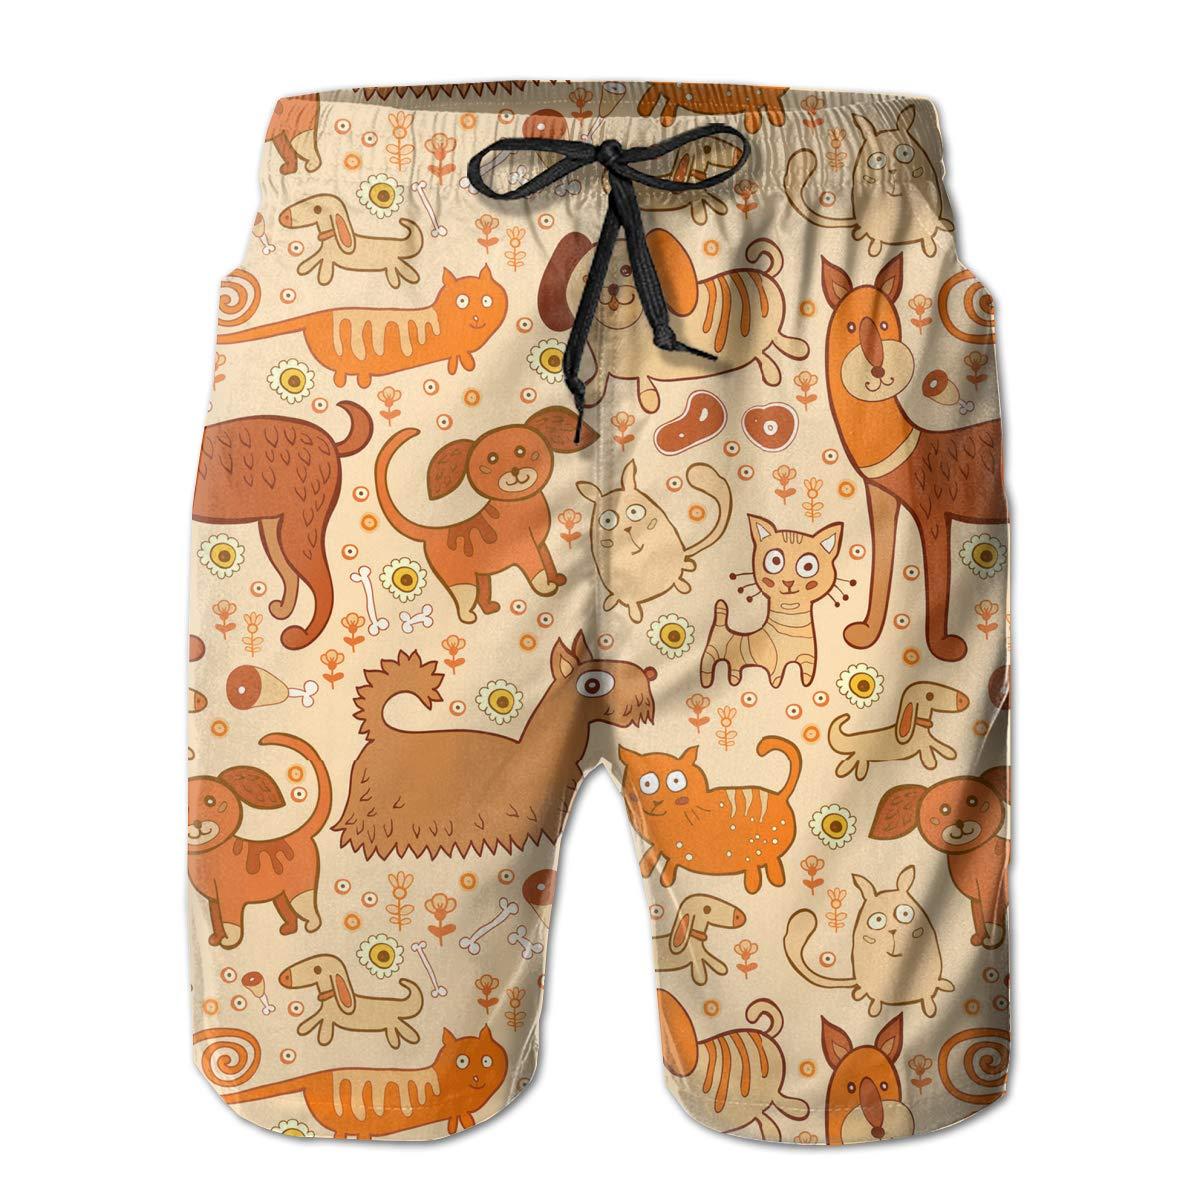 APPCLL Fashion Swim Trunks Mens Board Shorts Good Dachshund Dog Quick Dry Shorts